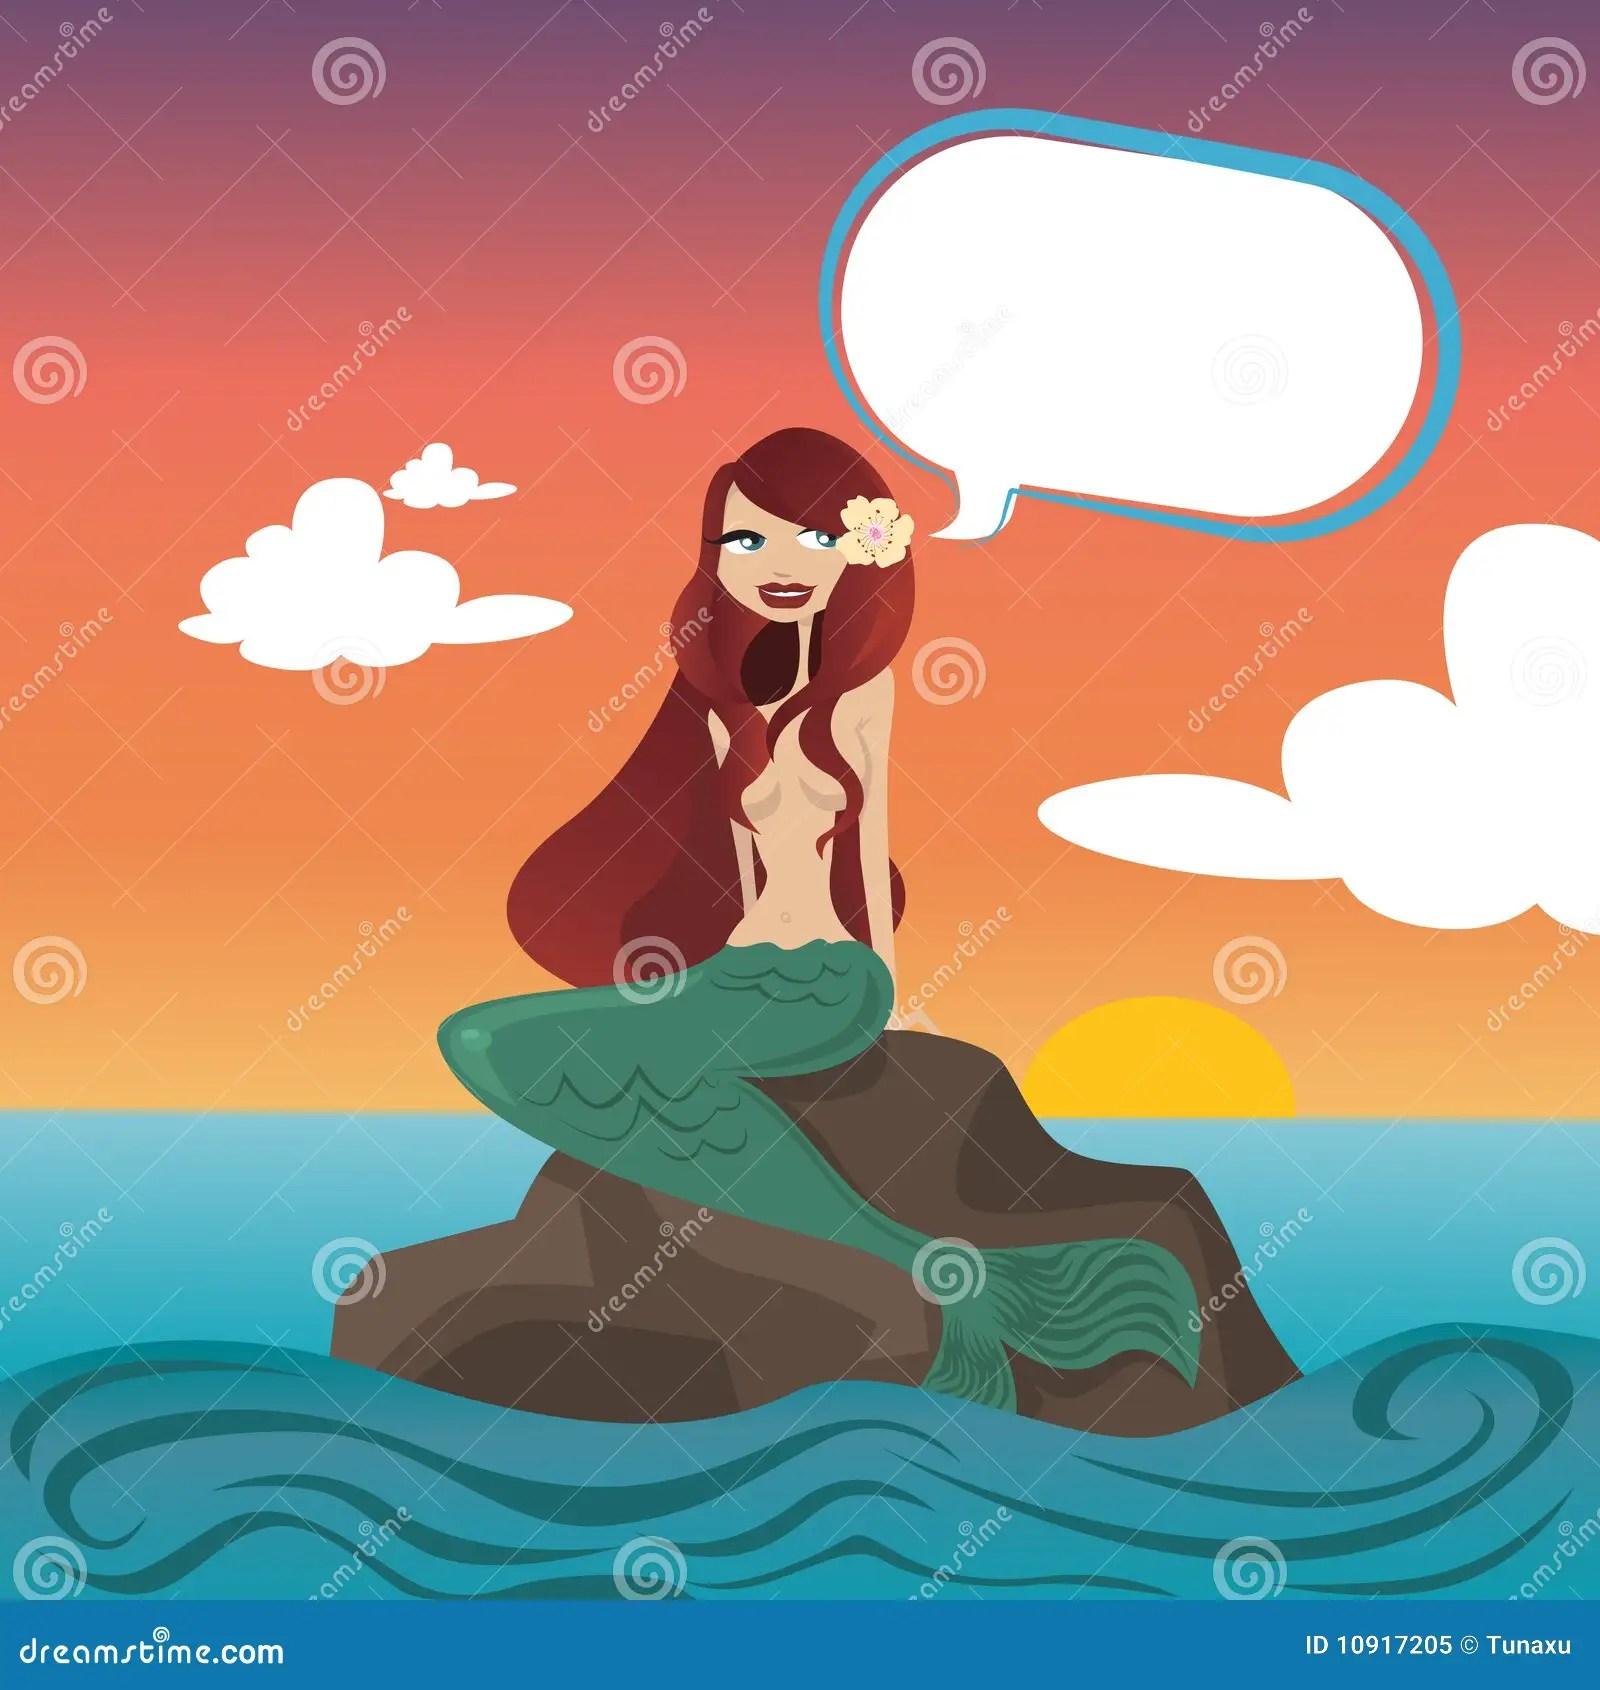 Fantasy Wallpaper Little Girl Beautiful Mermaid Royalty Free Stock Photo Image 10917205